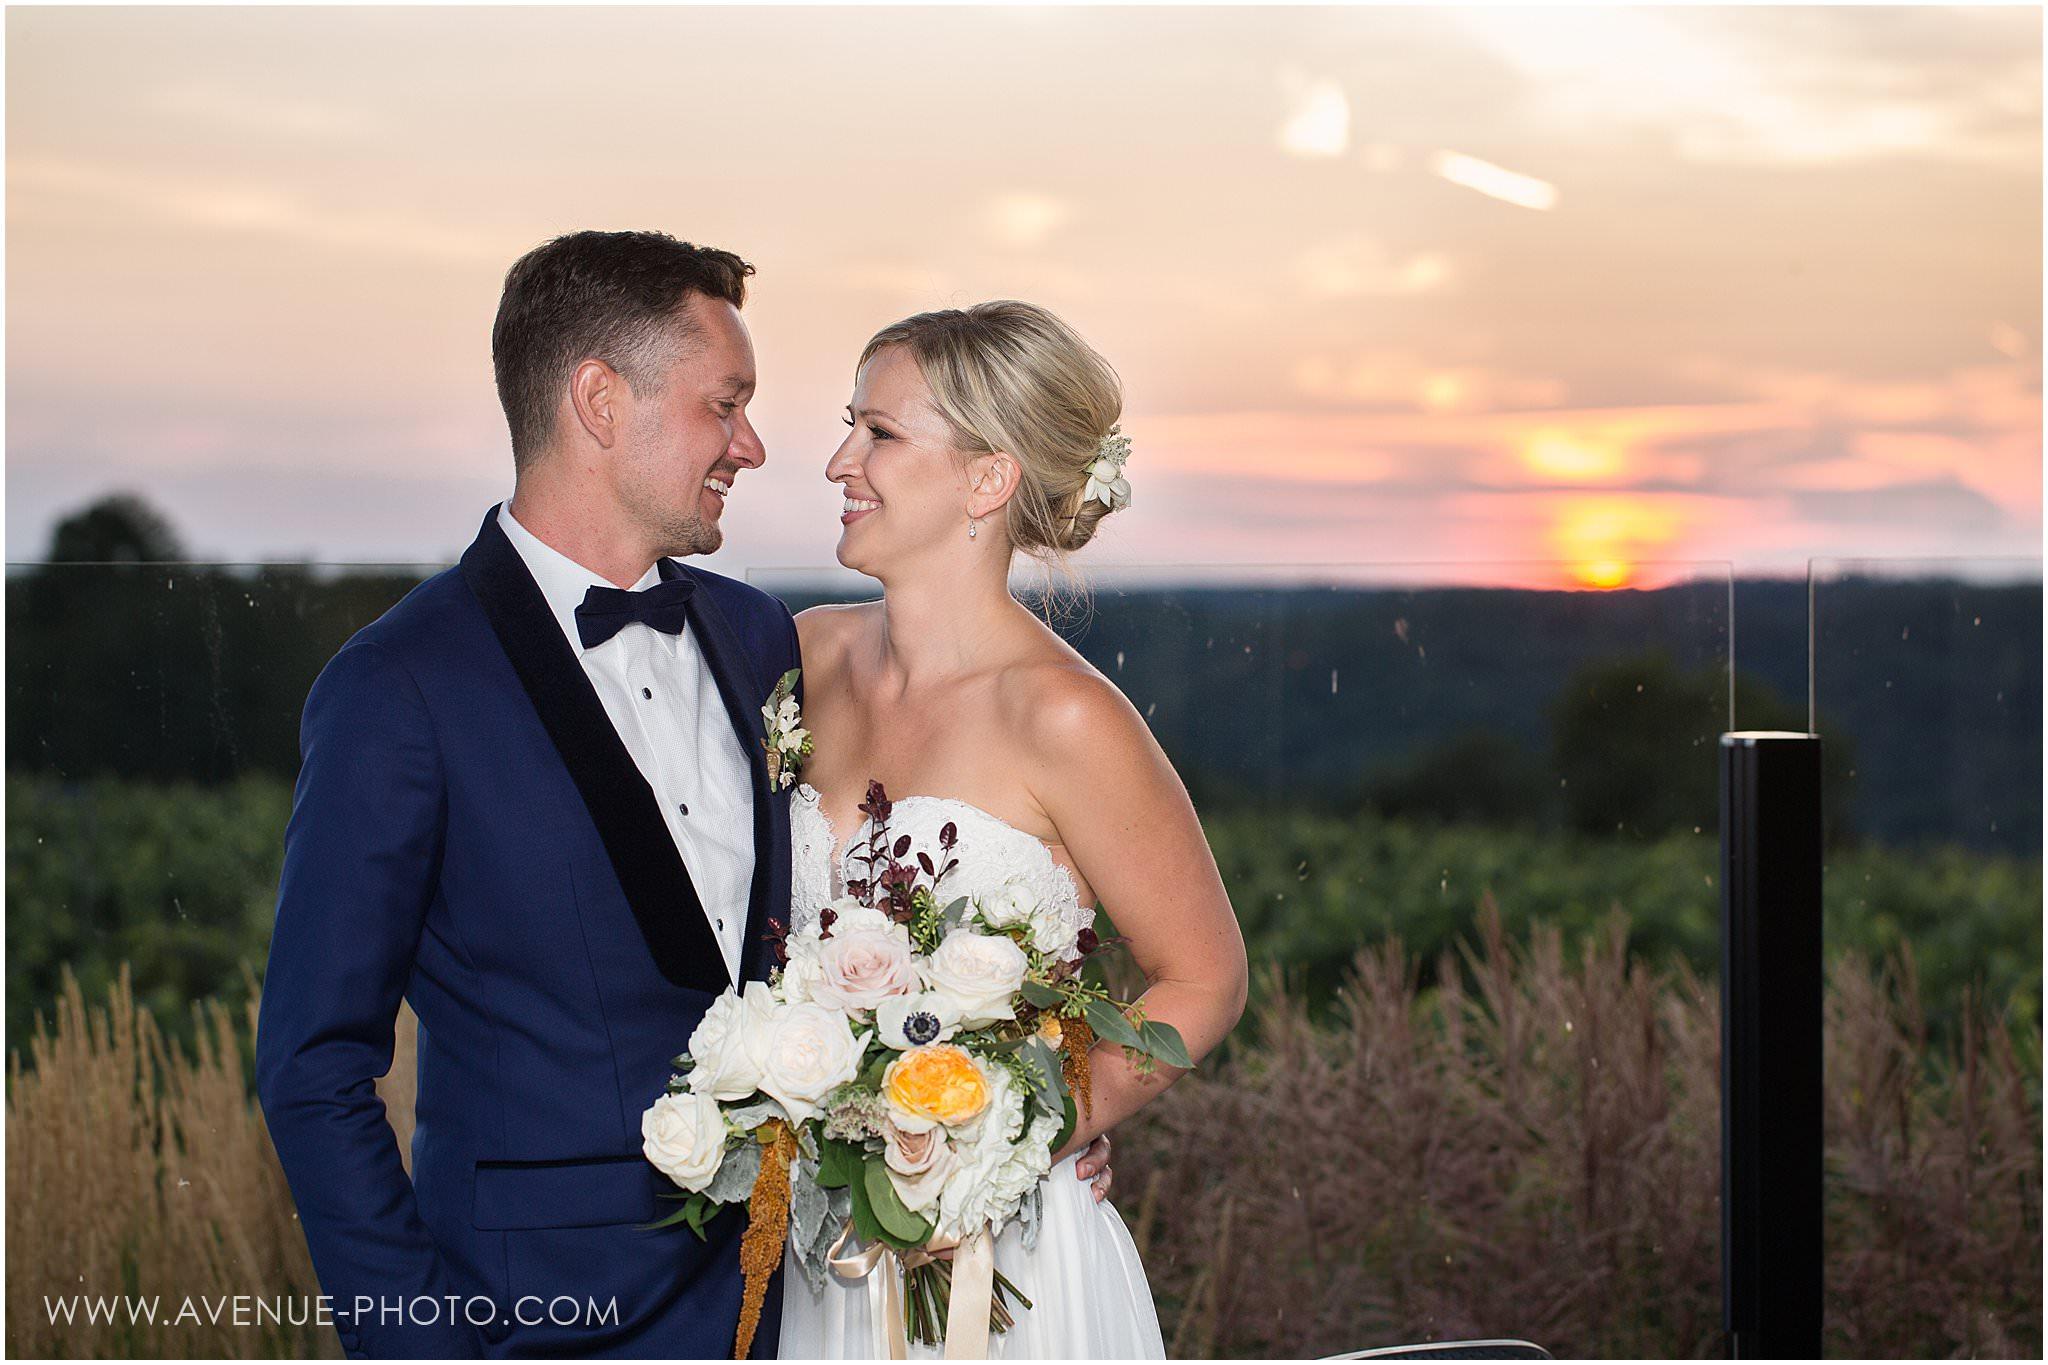 Adamo Estate Winery Wedding Photos, Hockley Valley Wedding Photos, Orangeville Wedding Photos, Vineyard Wedding, Avenue Photo, Sunset Photos